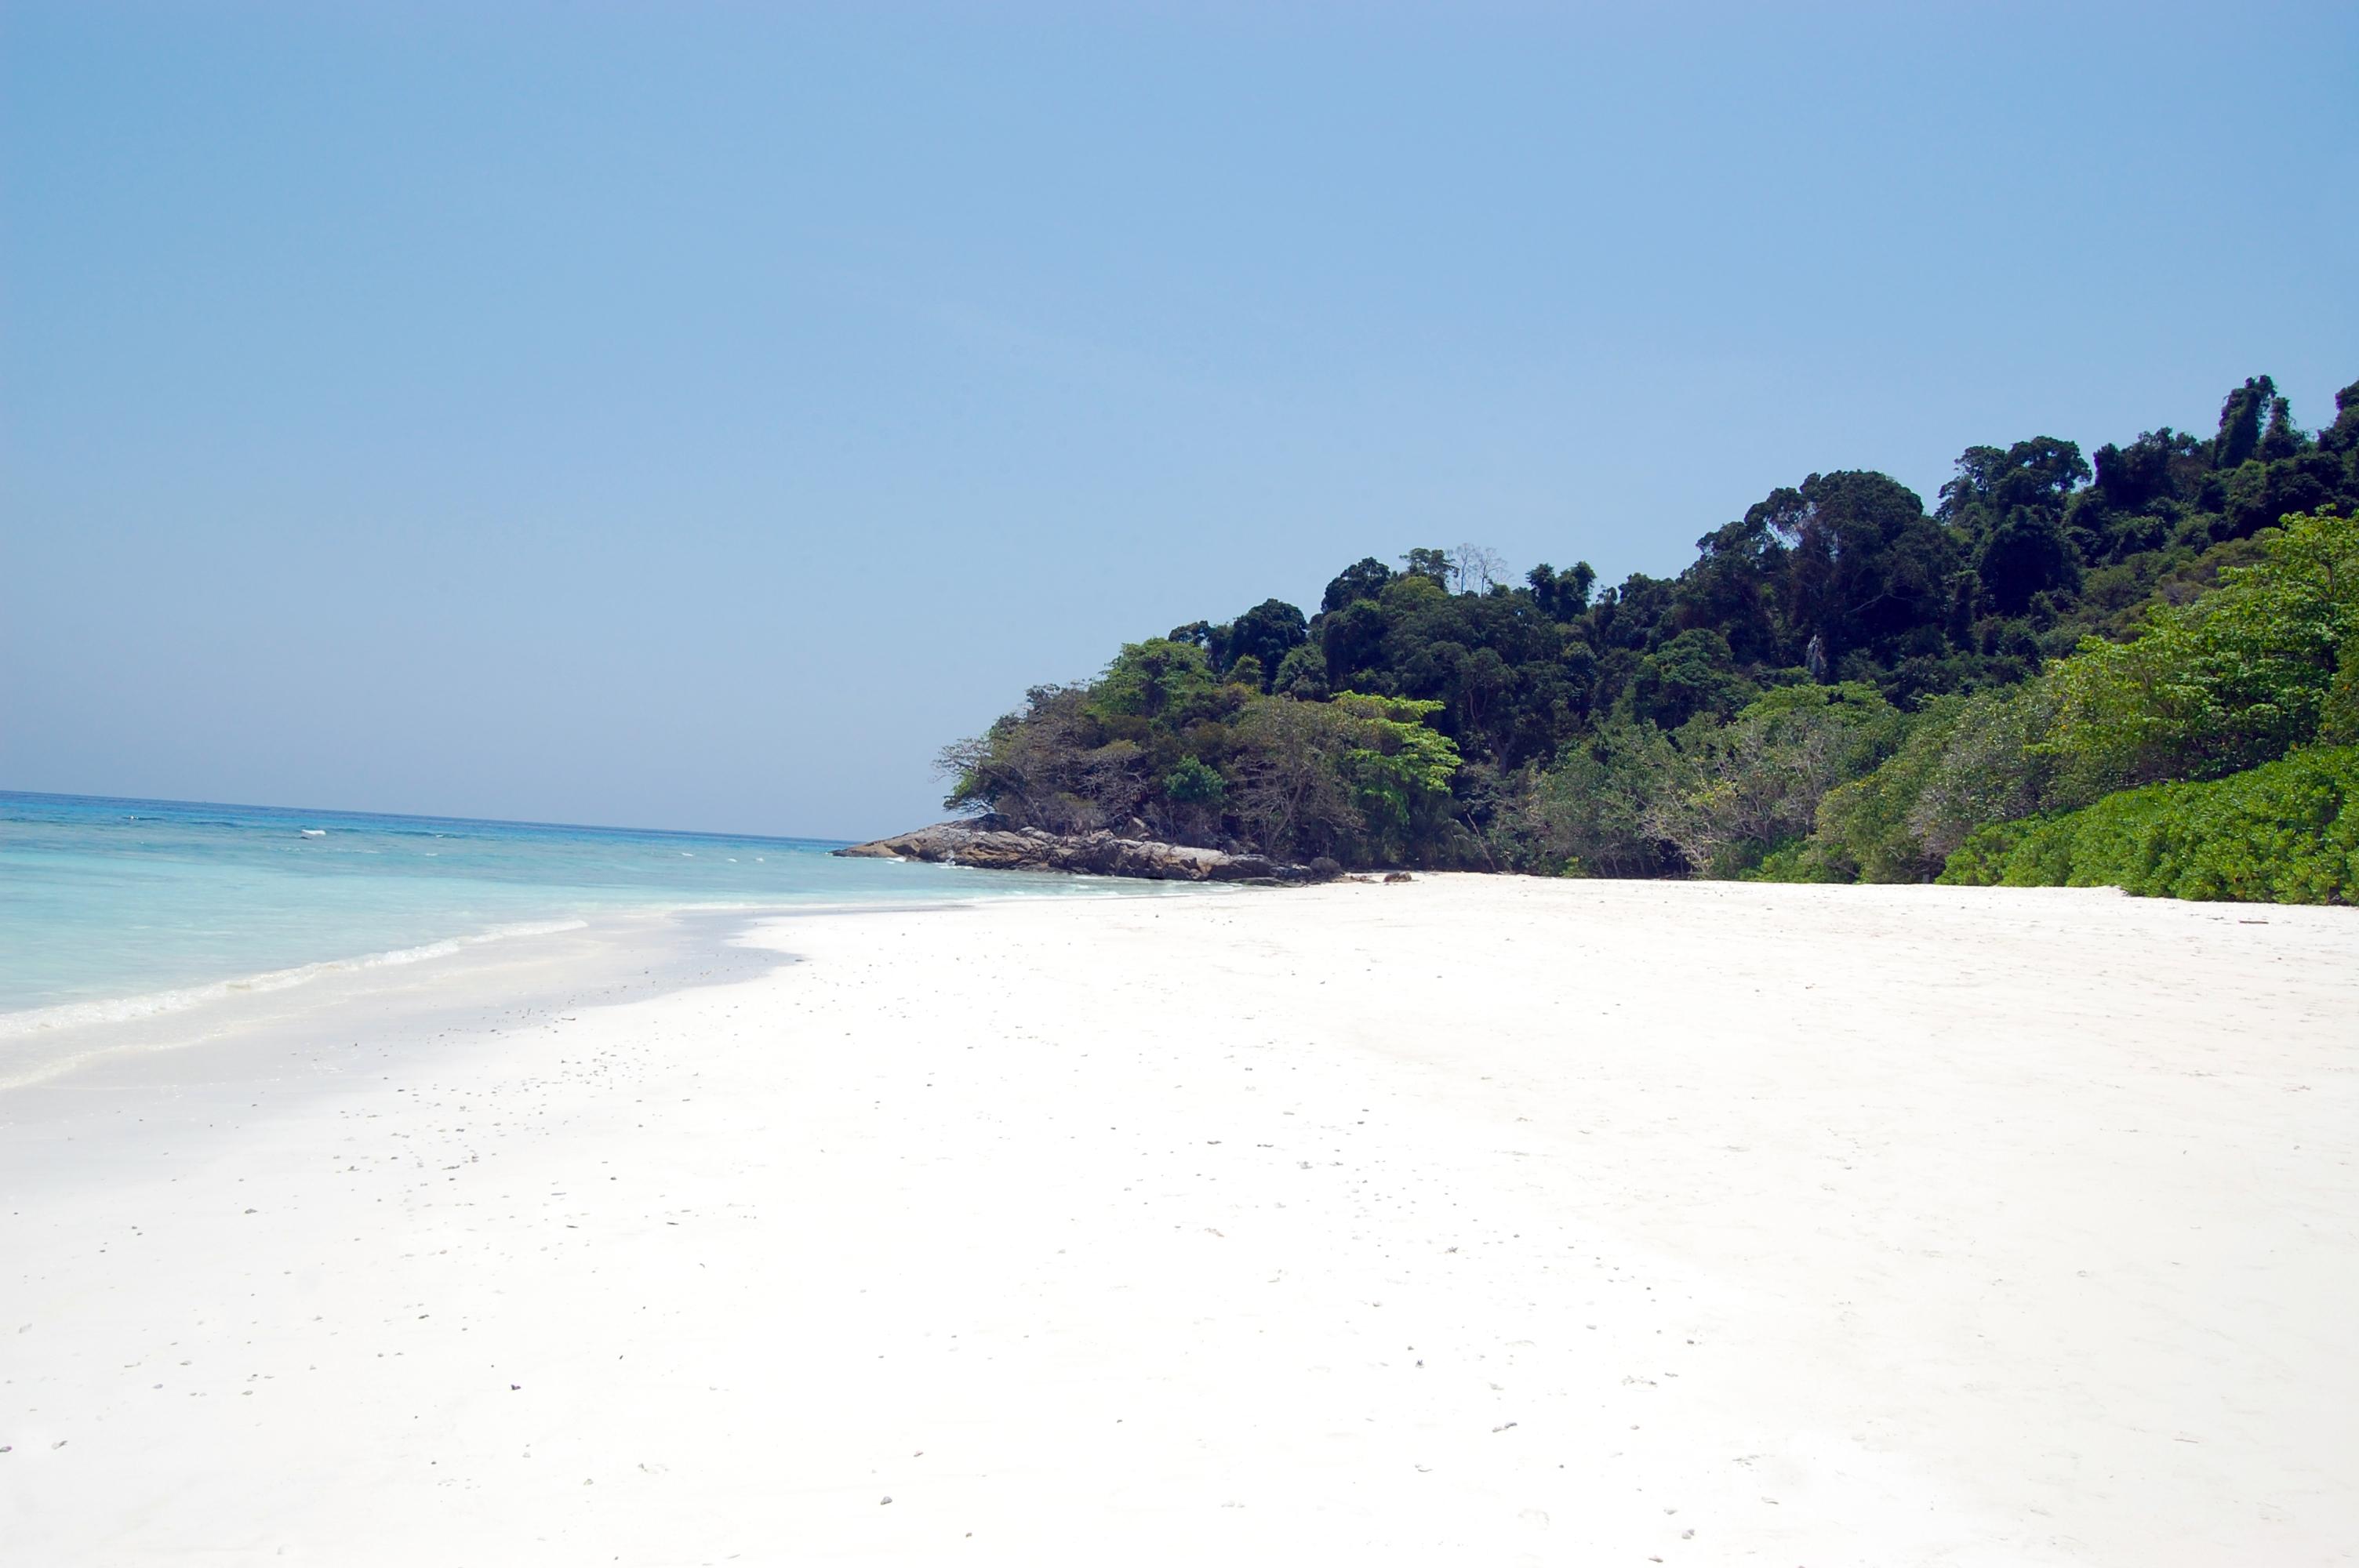 Traumstrand auf Tachai Island